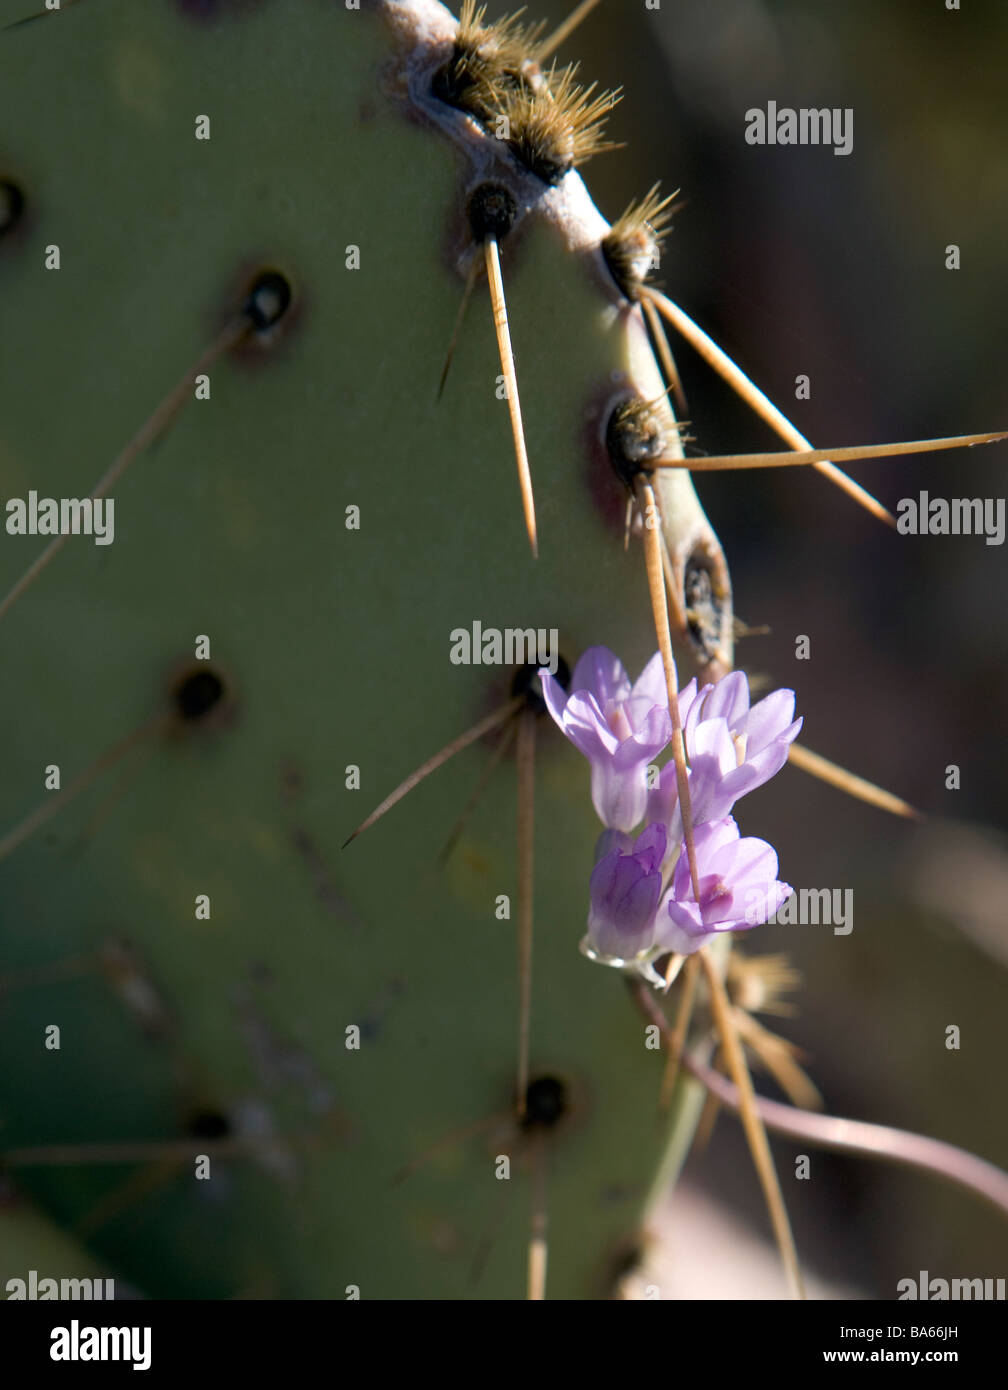 Small purple wildflowers blooming amongst the thorns of a Prickly Pear cactus in Arizona Allium atropurpureum - Stock Image